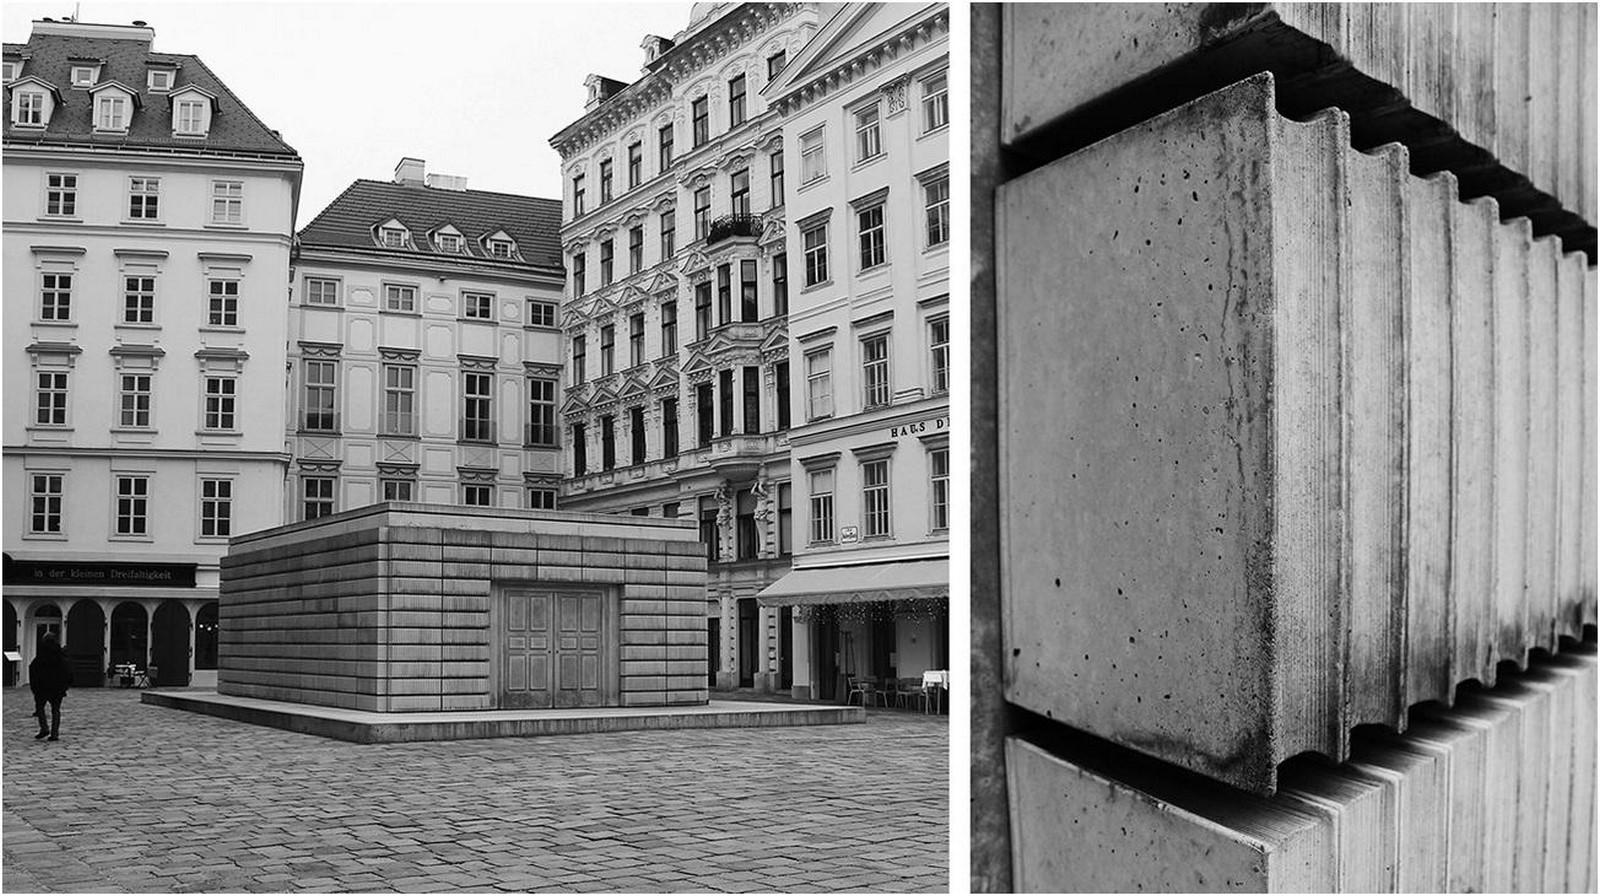 Judenplatz Holocaust Memorial by Rachel Whiteread: A plethora of signs - Sheet1